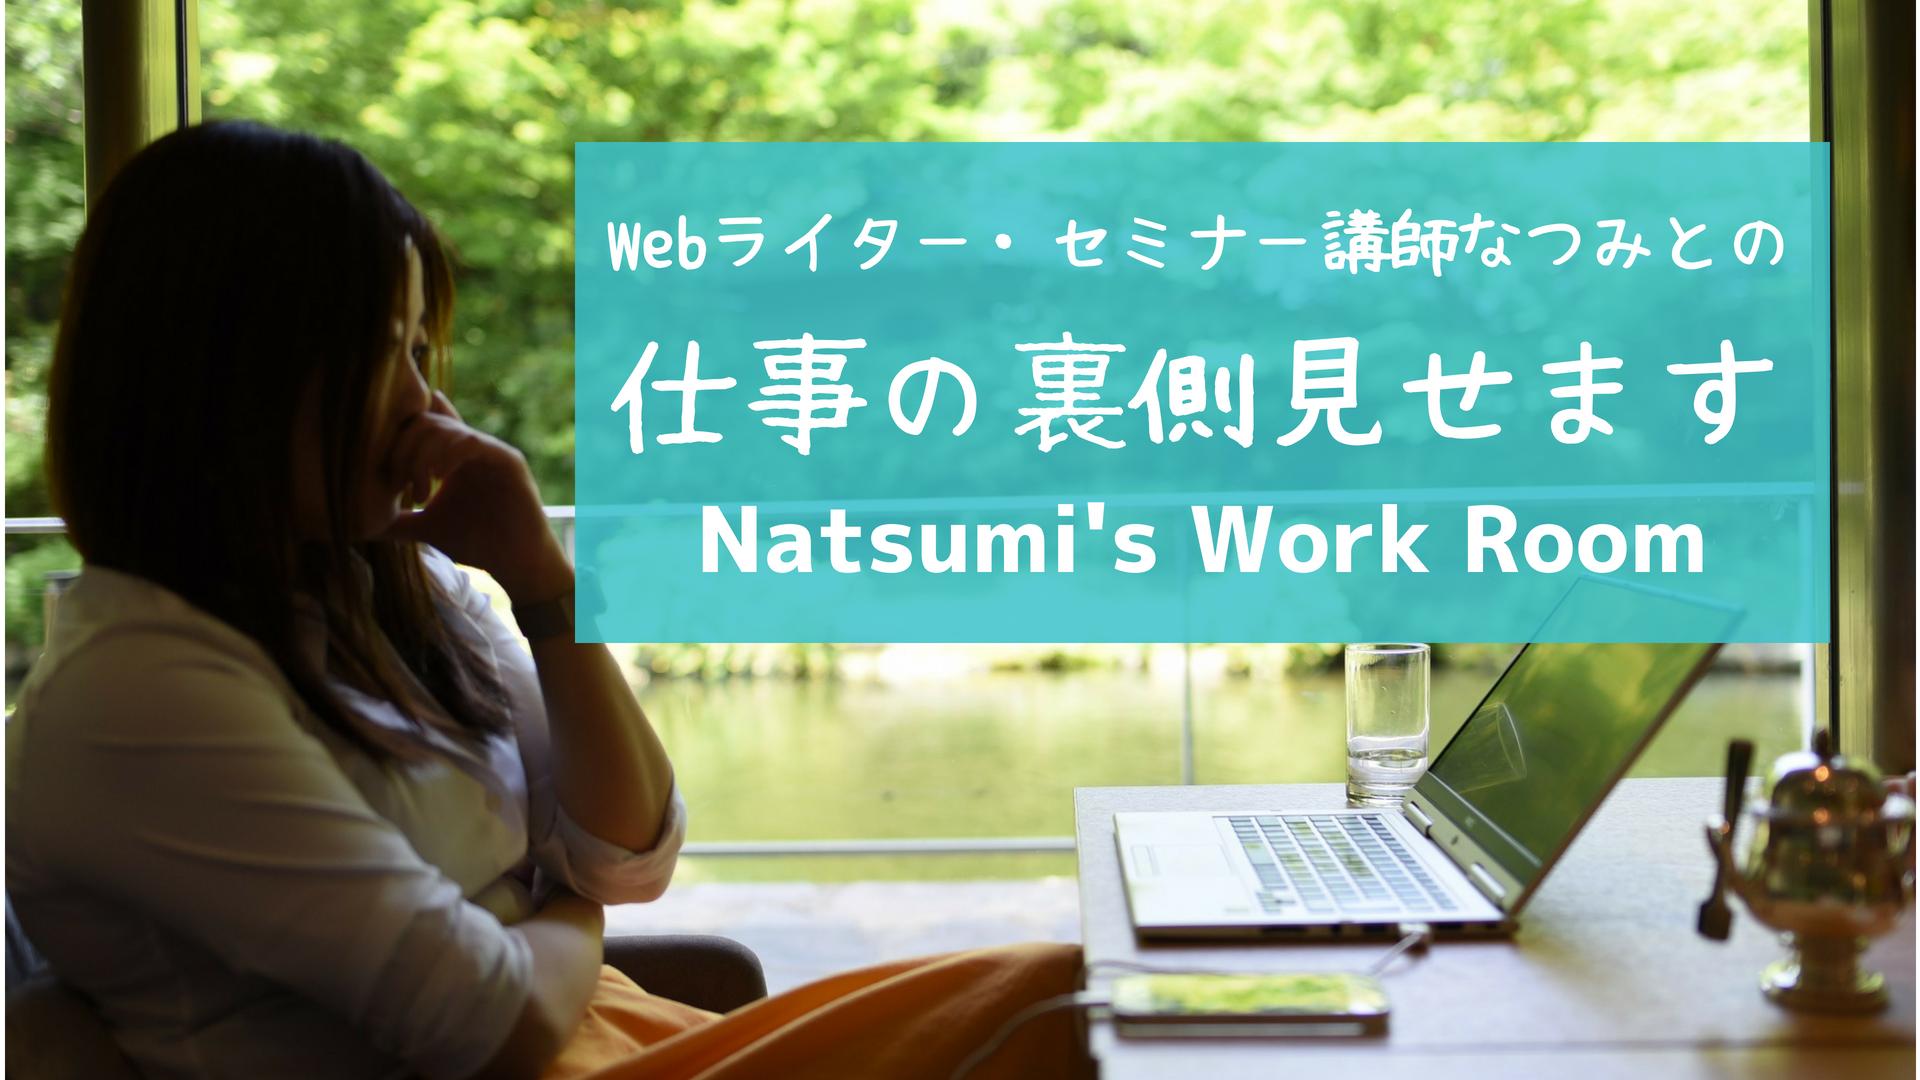 Natsumi's Work Roomーなつみとの仕事の裏側ー